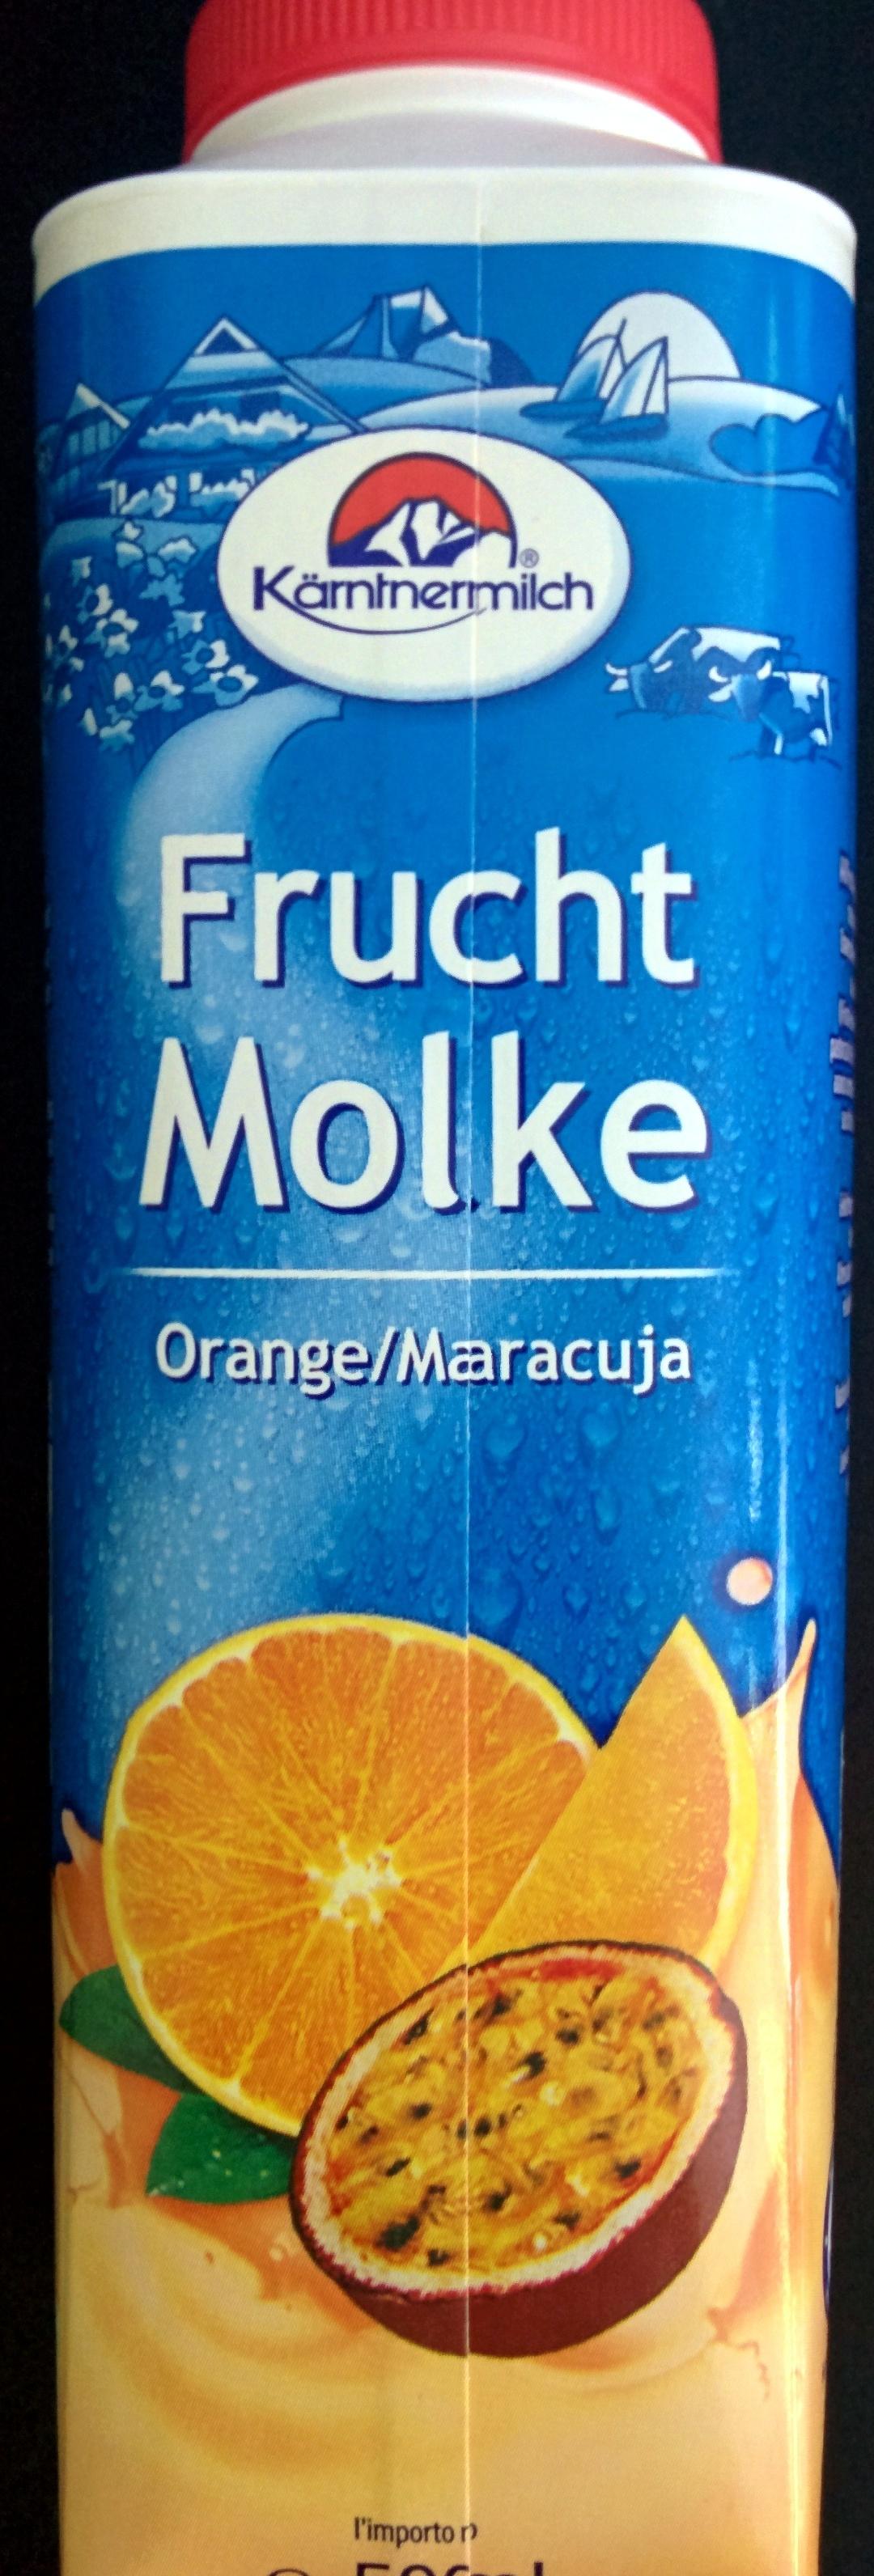 Fucht Molke Orange/Maracuja - Product - de